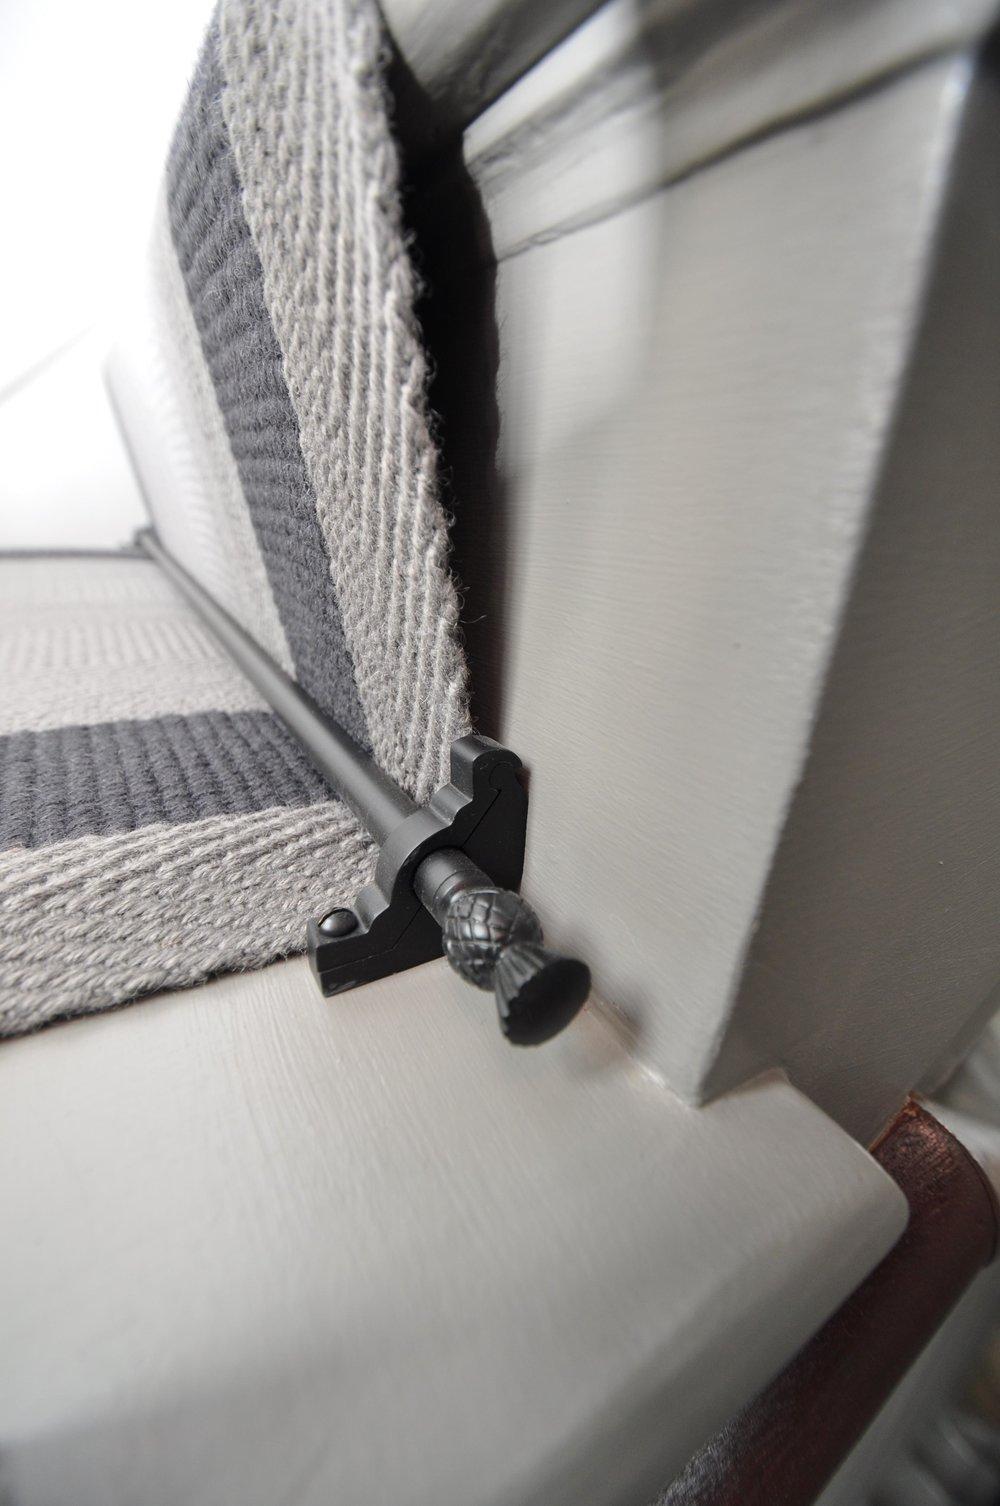 flatweave-stair-runner-london-bowloom-off-the-loom-geometric-carpet-DSC_1118.jpg